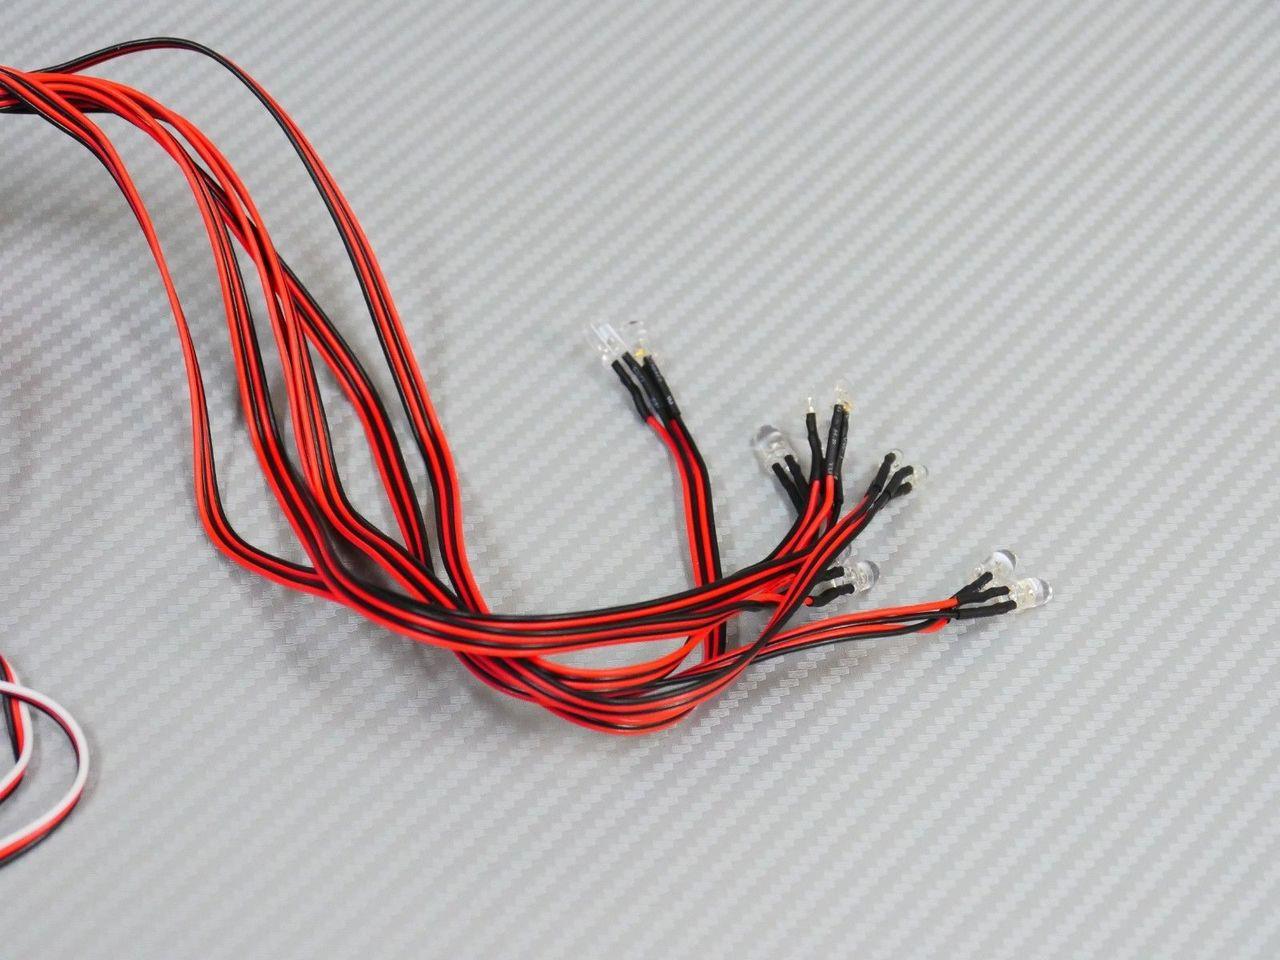 1//10 RC Car LED LIGHT SET w// Control Box For Skyline HT 2000 Killer Body #48687